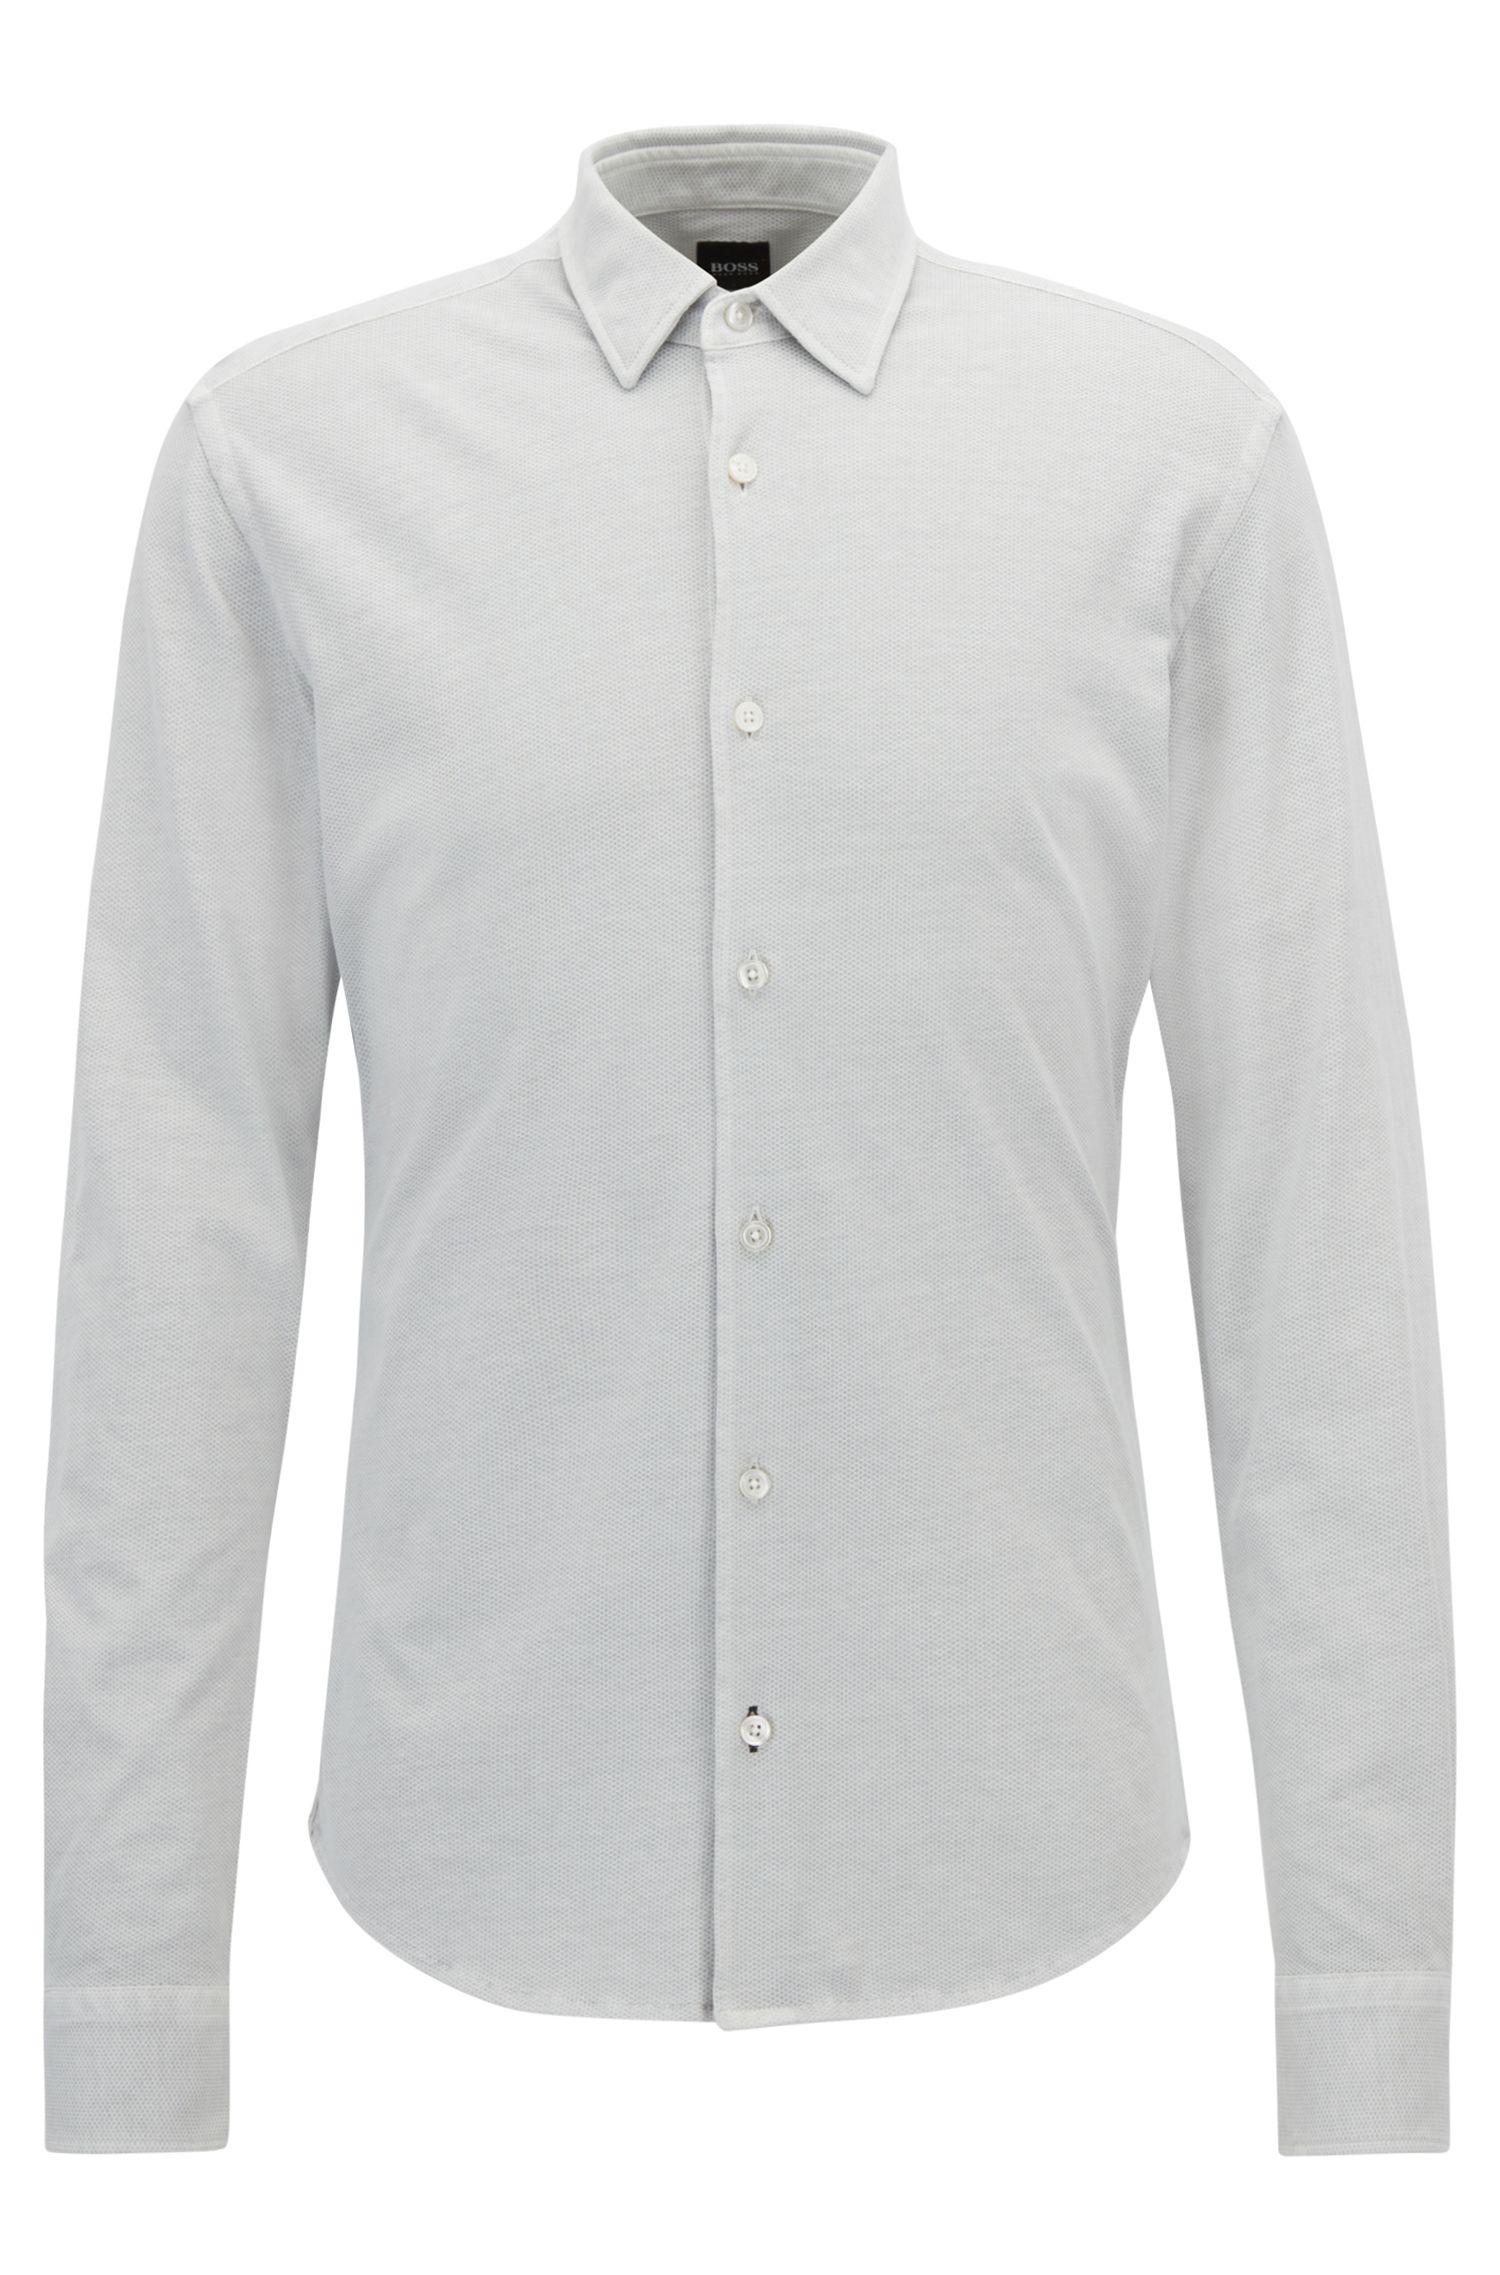 Cotton Sport Shirt, Slim Fit | Reid F, Open Grey